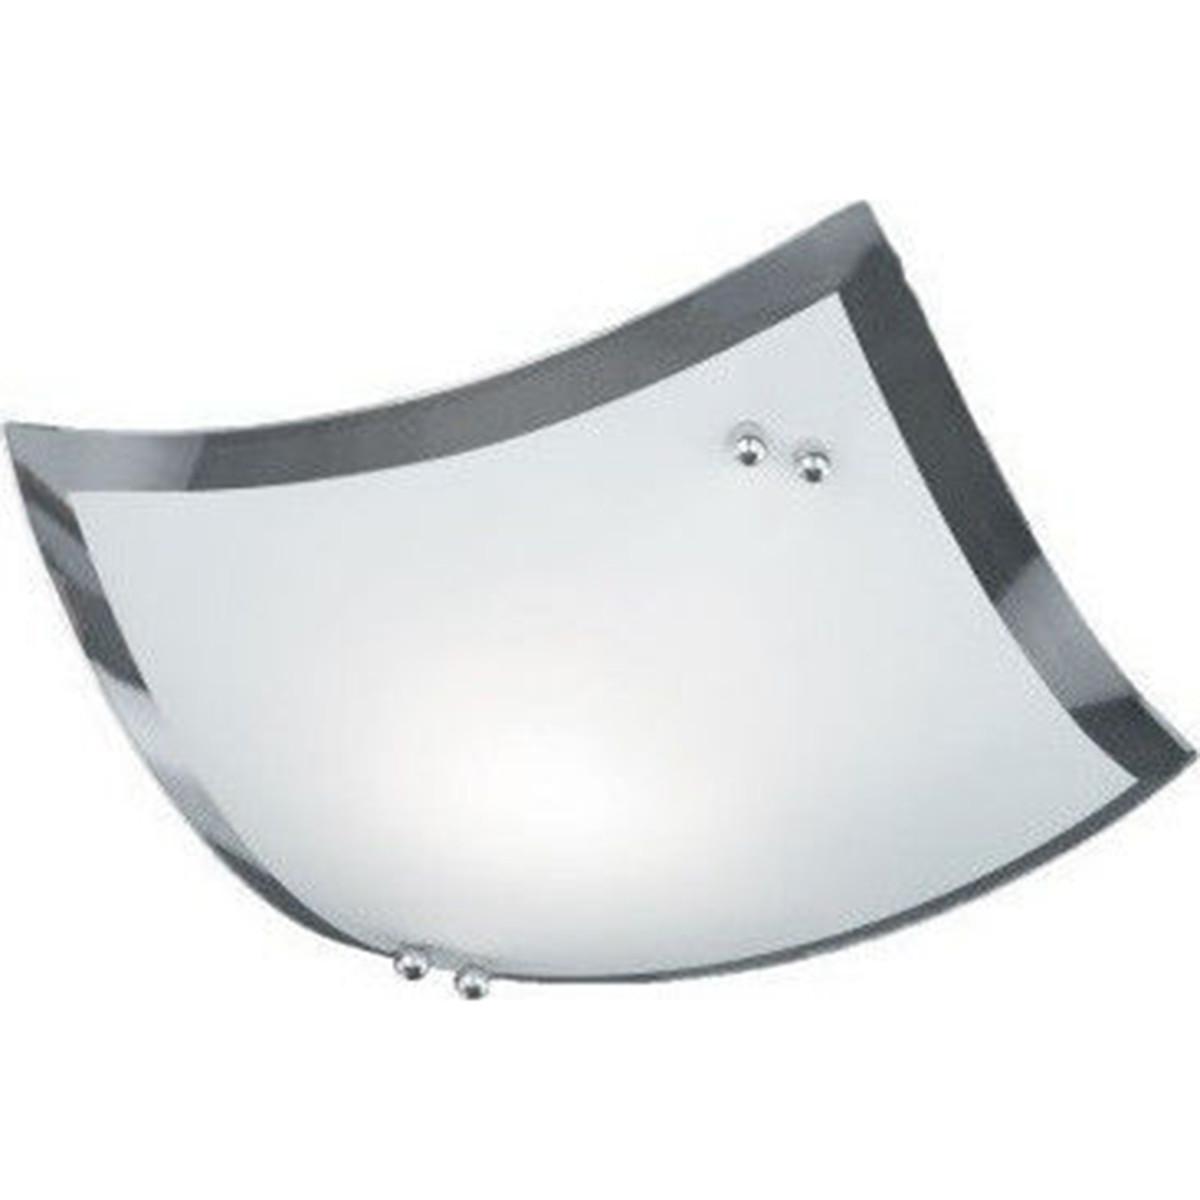 LED Plafondlamp - Plafondverlichting - Trion Bisu - E27 Fitting - Vierkant - Glans Chroom - Aluminiu